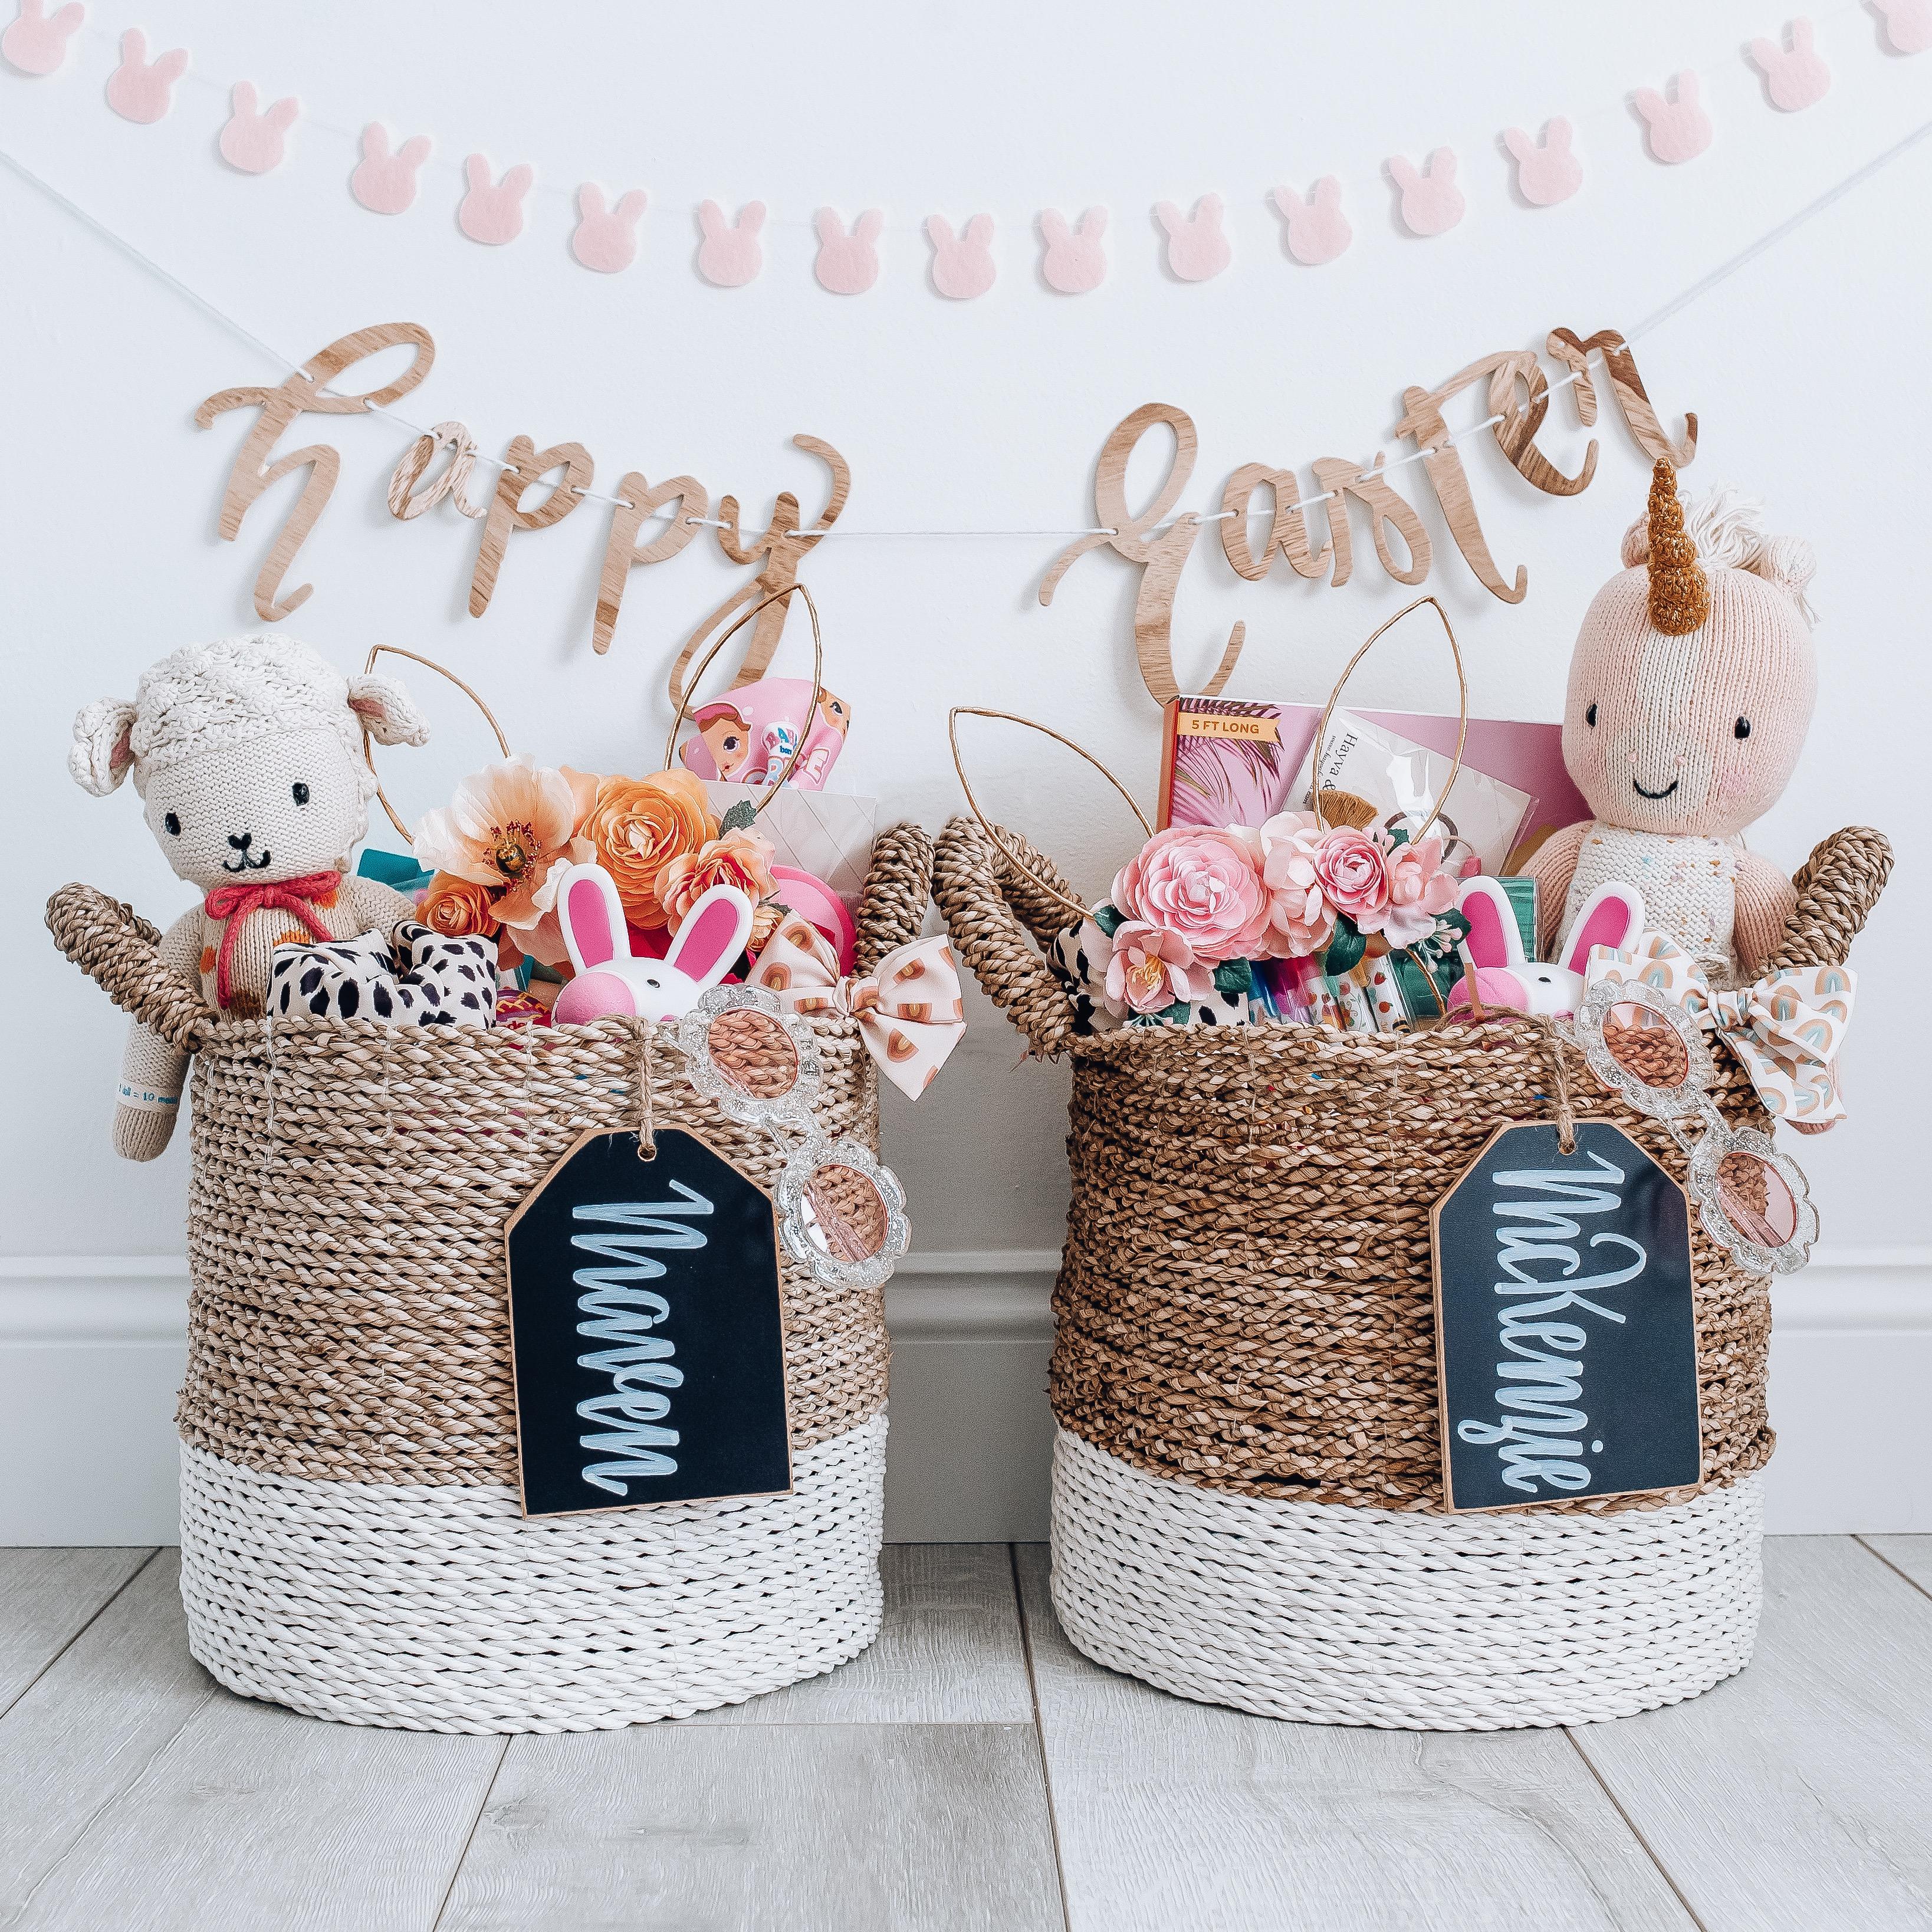 kid-friendly easter baskets, easter basket ideas, happy easter